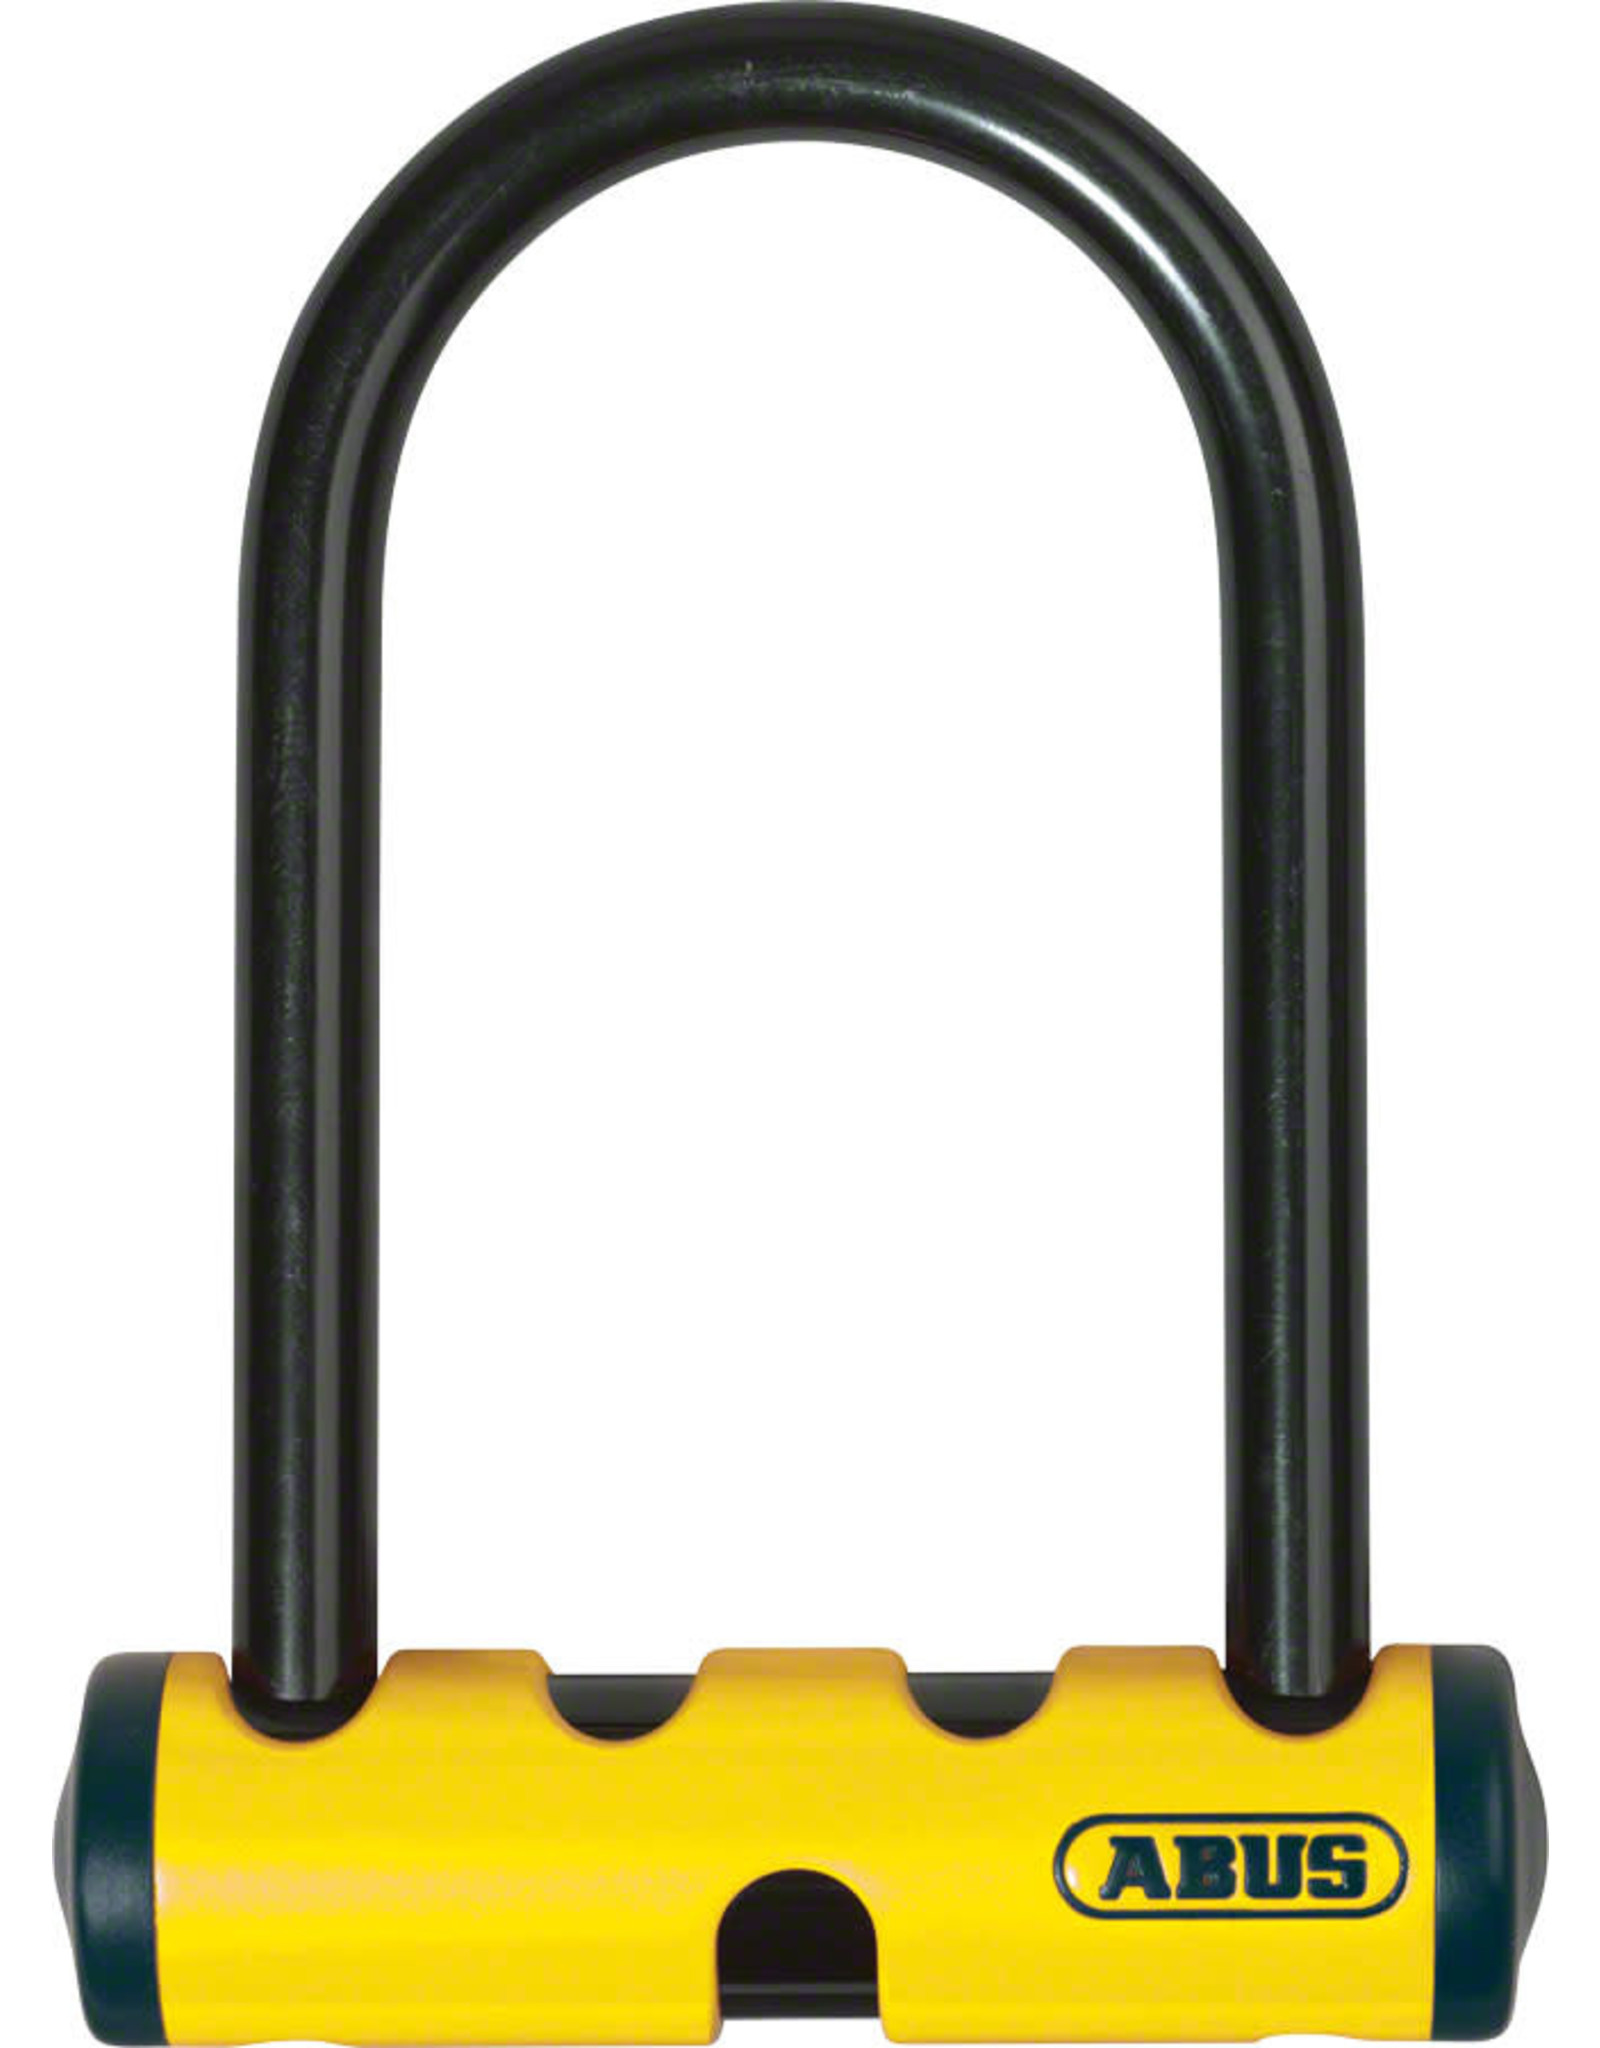 ABUS Abus U-Lock - U-Mini 40 yellow - 5.5 inch U / 15mm round shackle